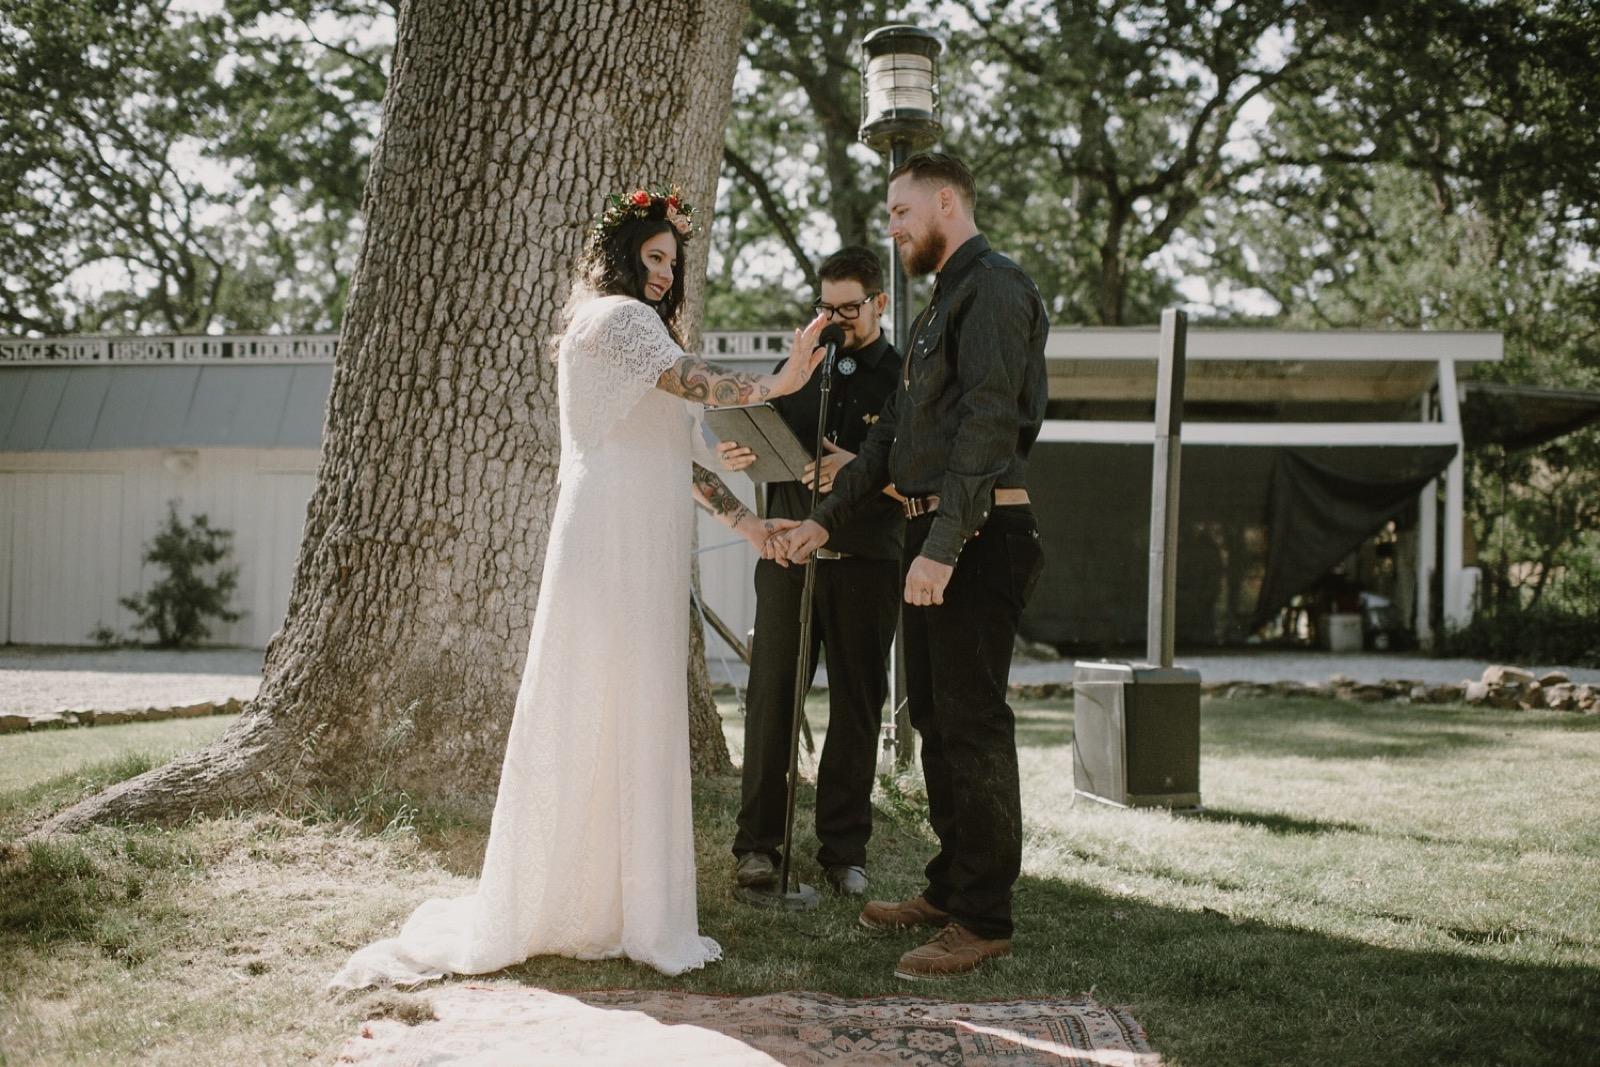 069_California_Ranch_Wedding177.jpg